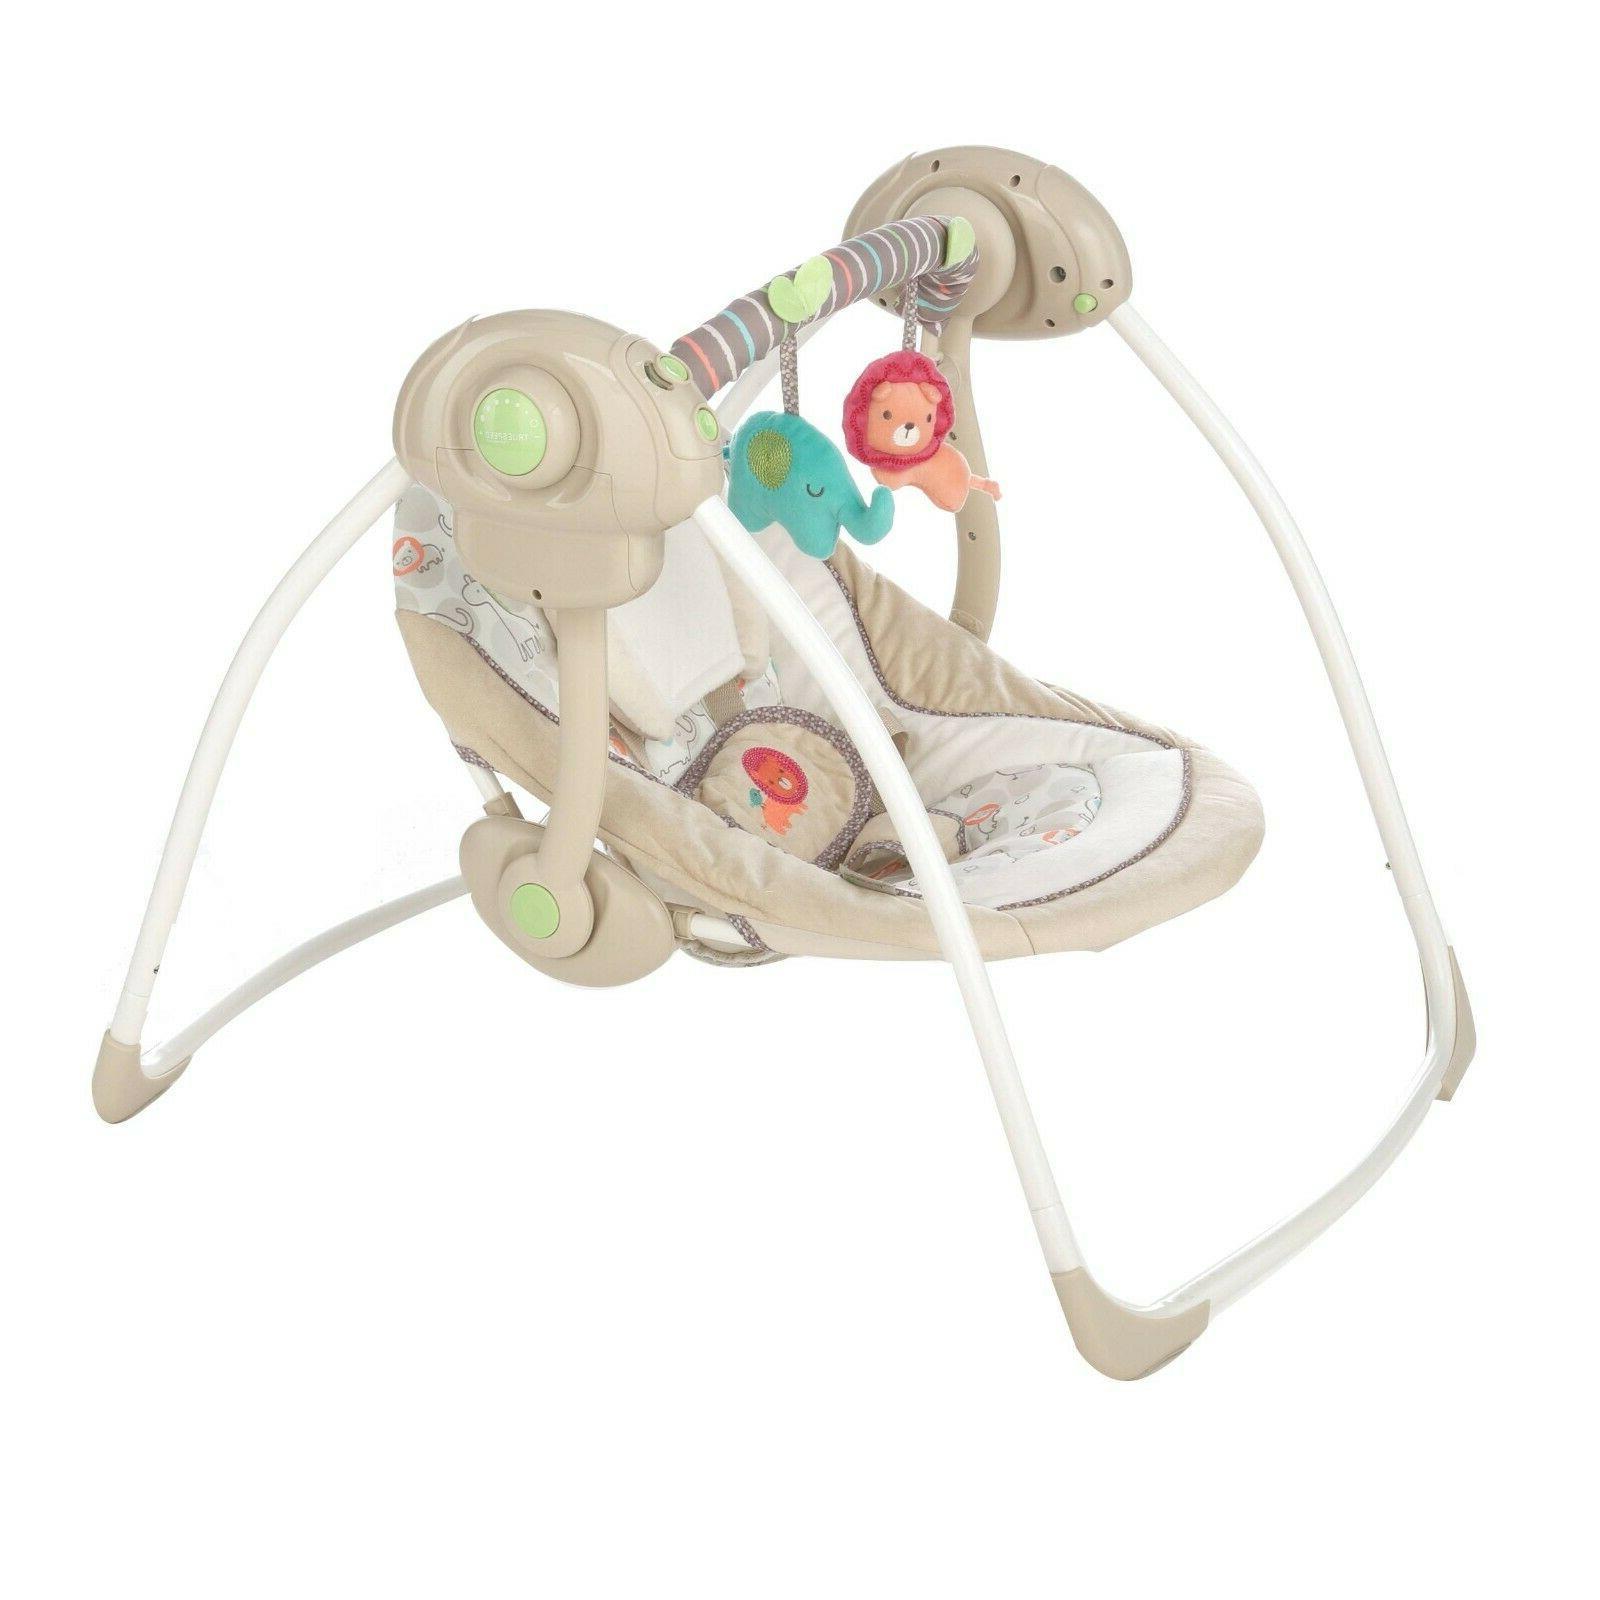 Baby Bouncer Rocker Portable Electric W/ Sounds Infant